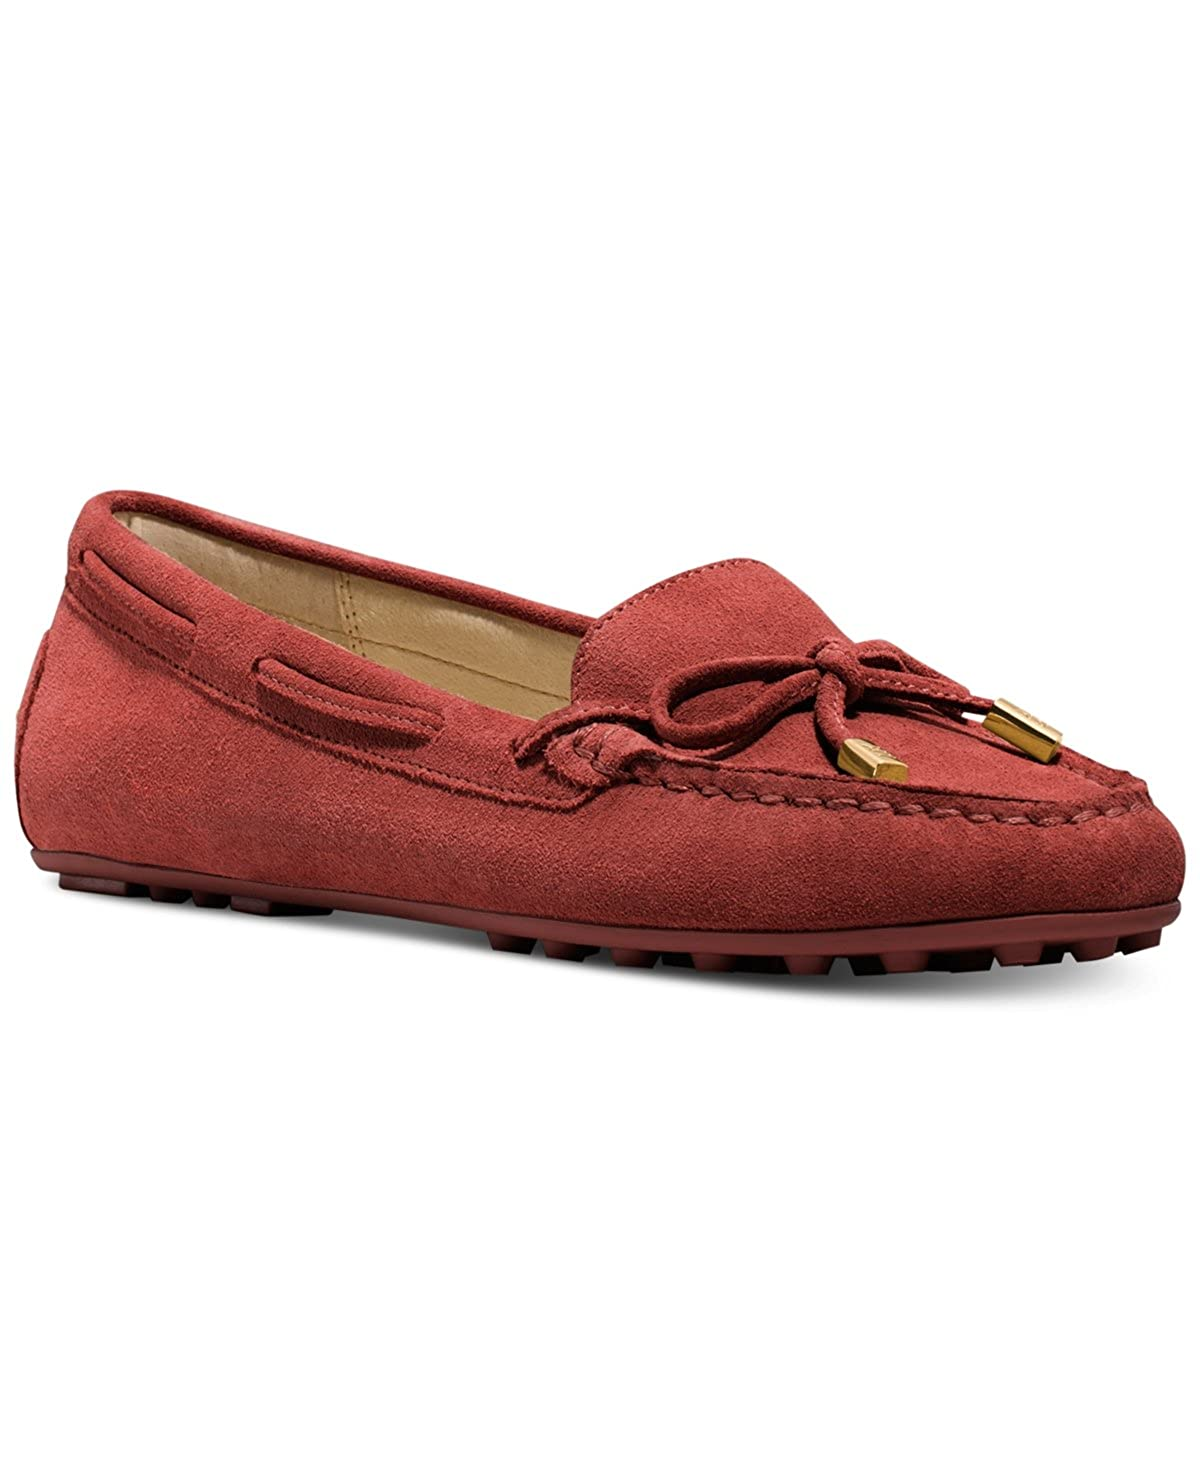 e4eb1c94b04f3 Amazon.com: MICHAEL Michael Kors Daisy Moc Flats, Size 7.5, Brick: Shoes